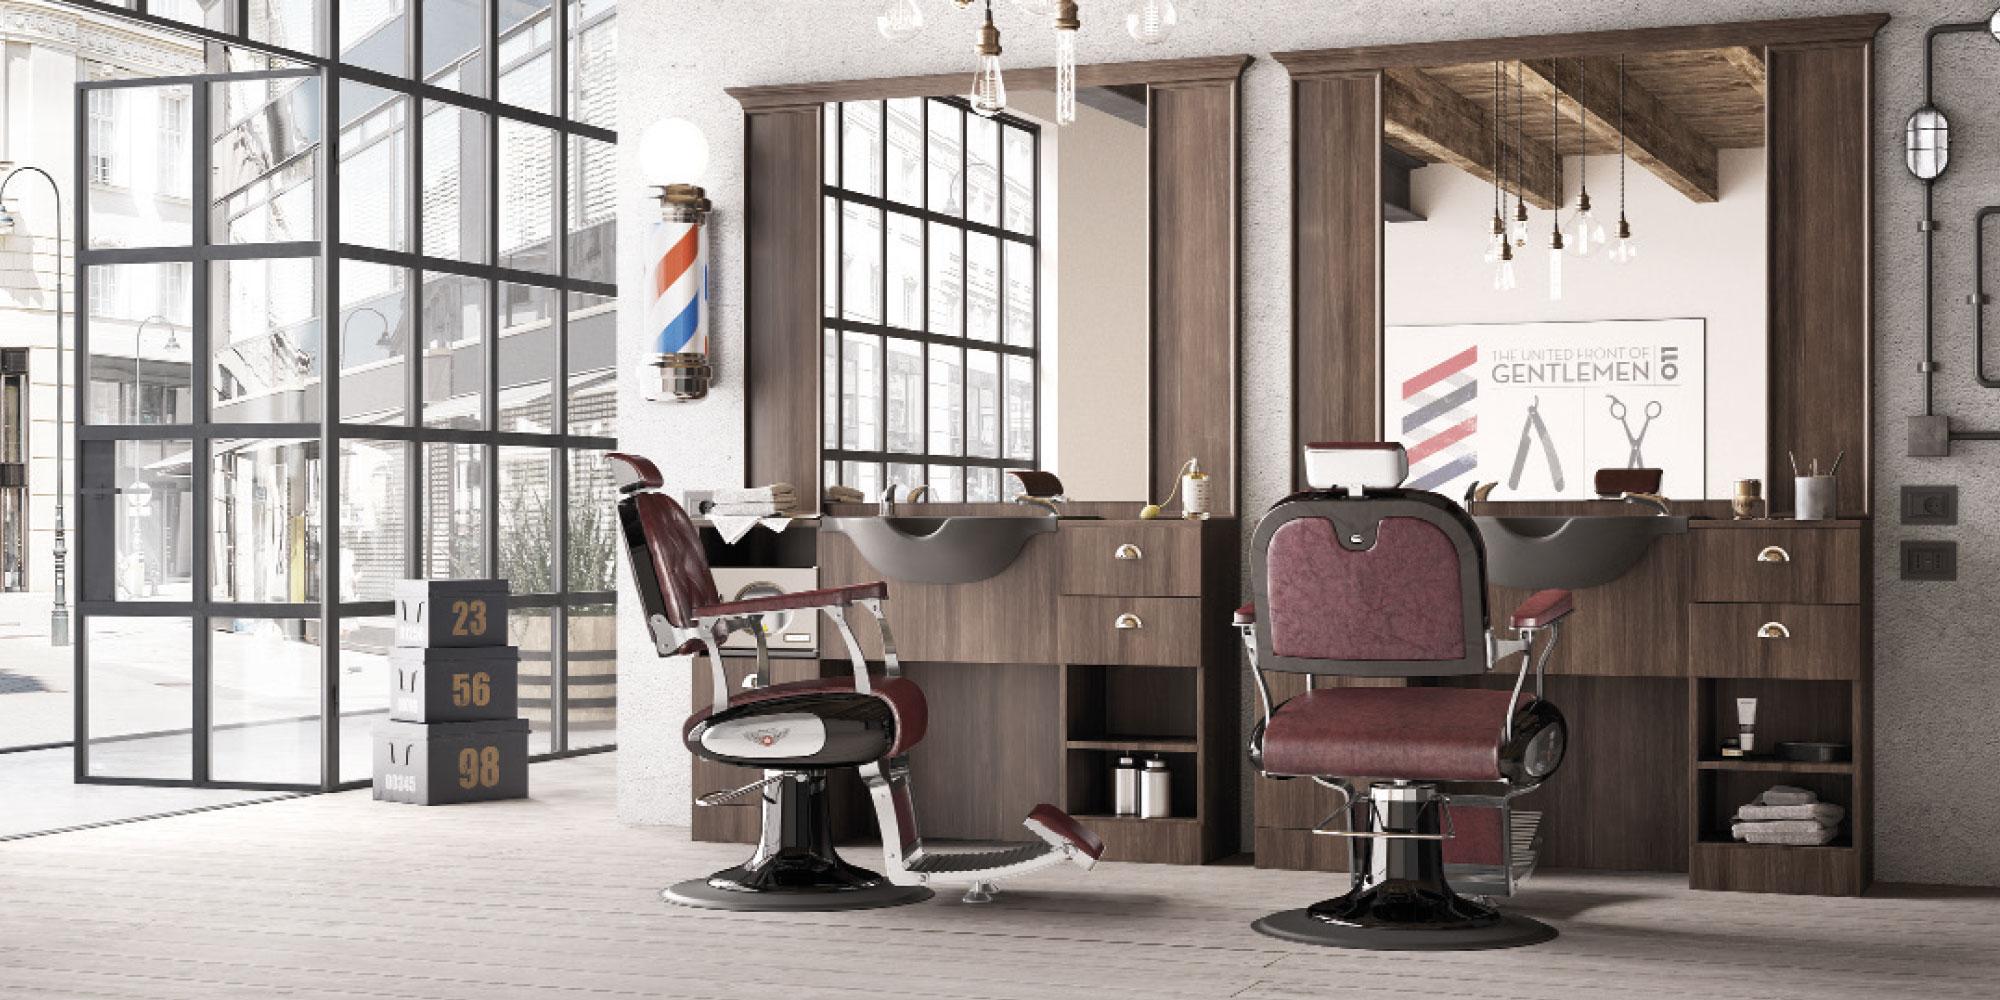 Inspiring Mobilier Salon De Coiffure Barbier